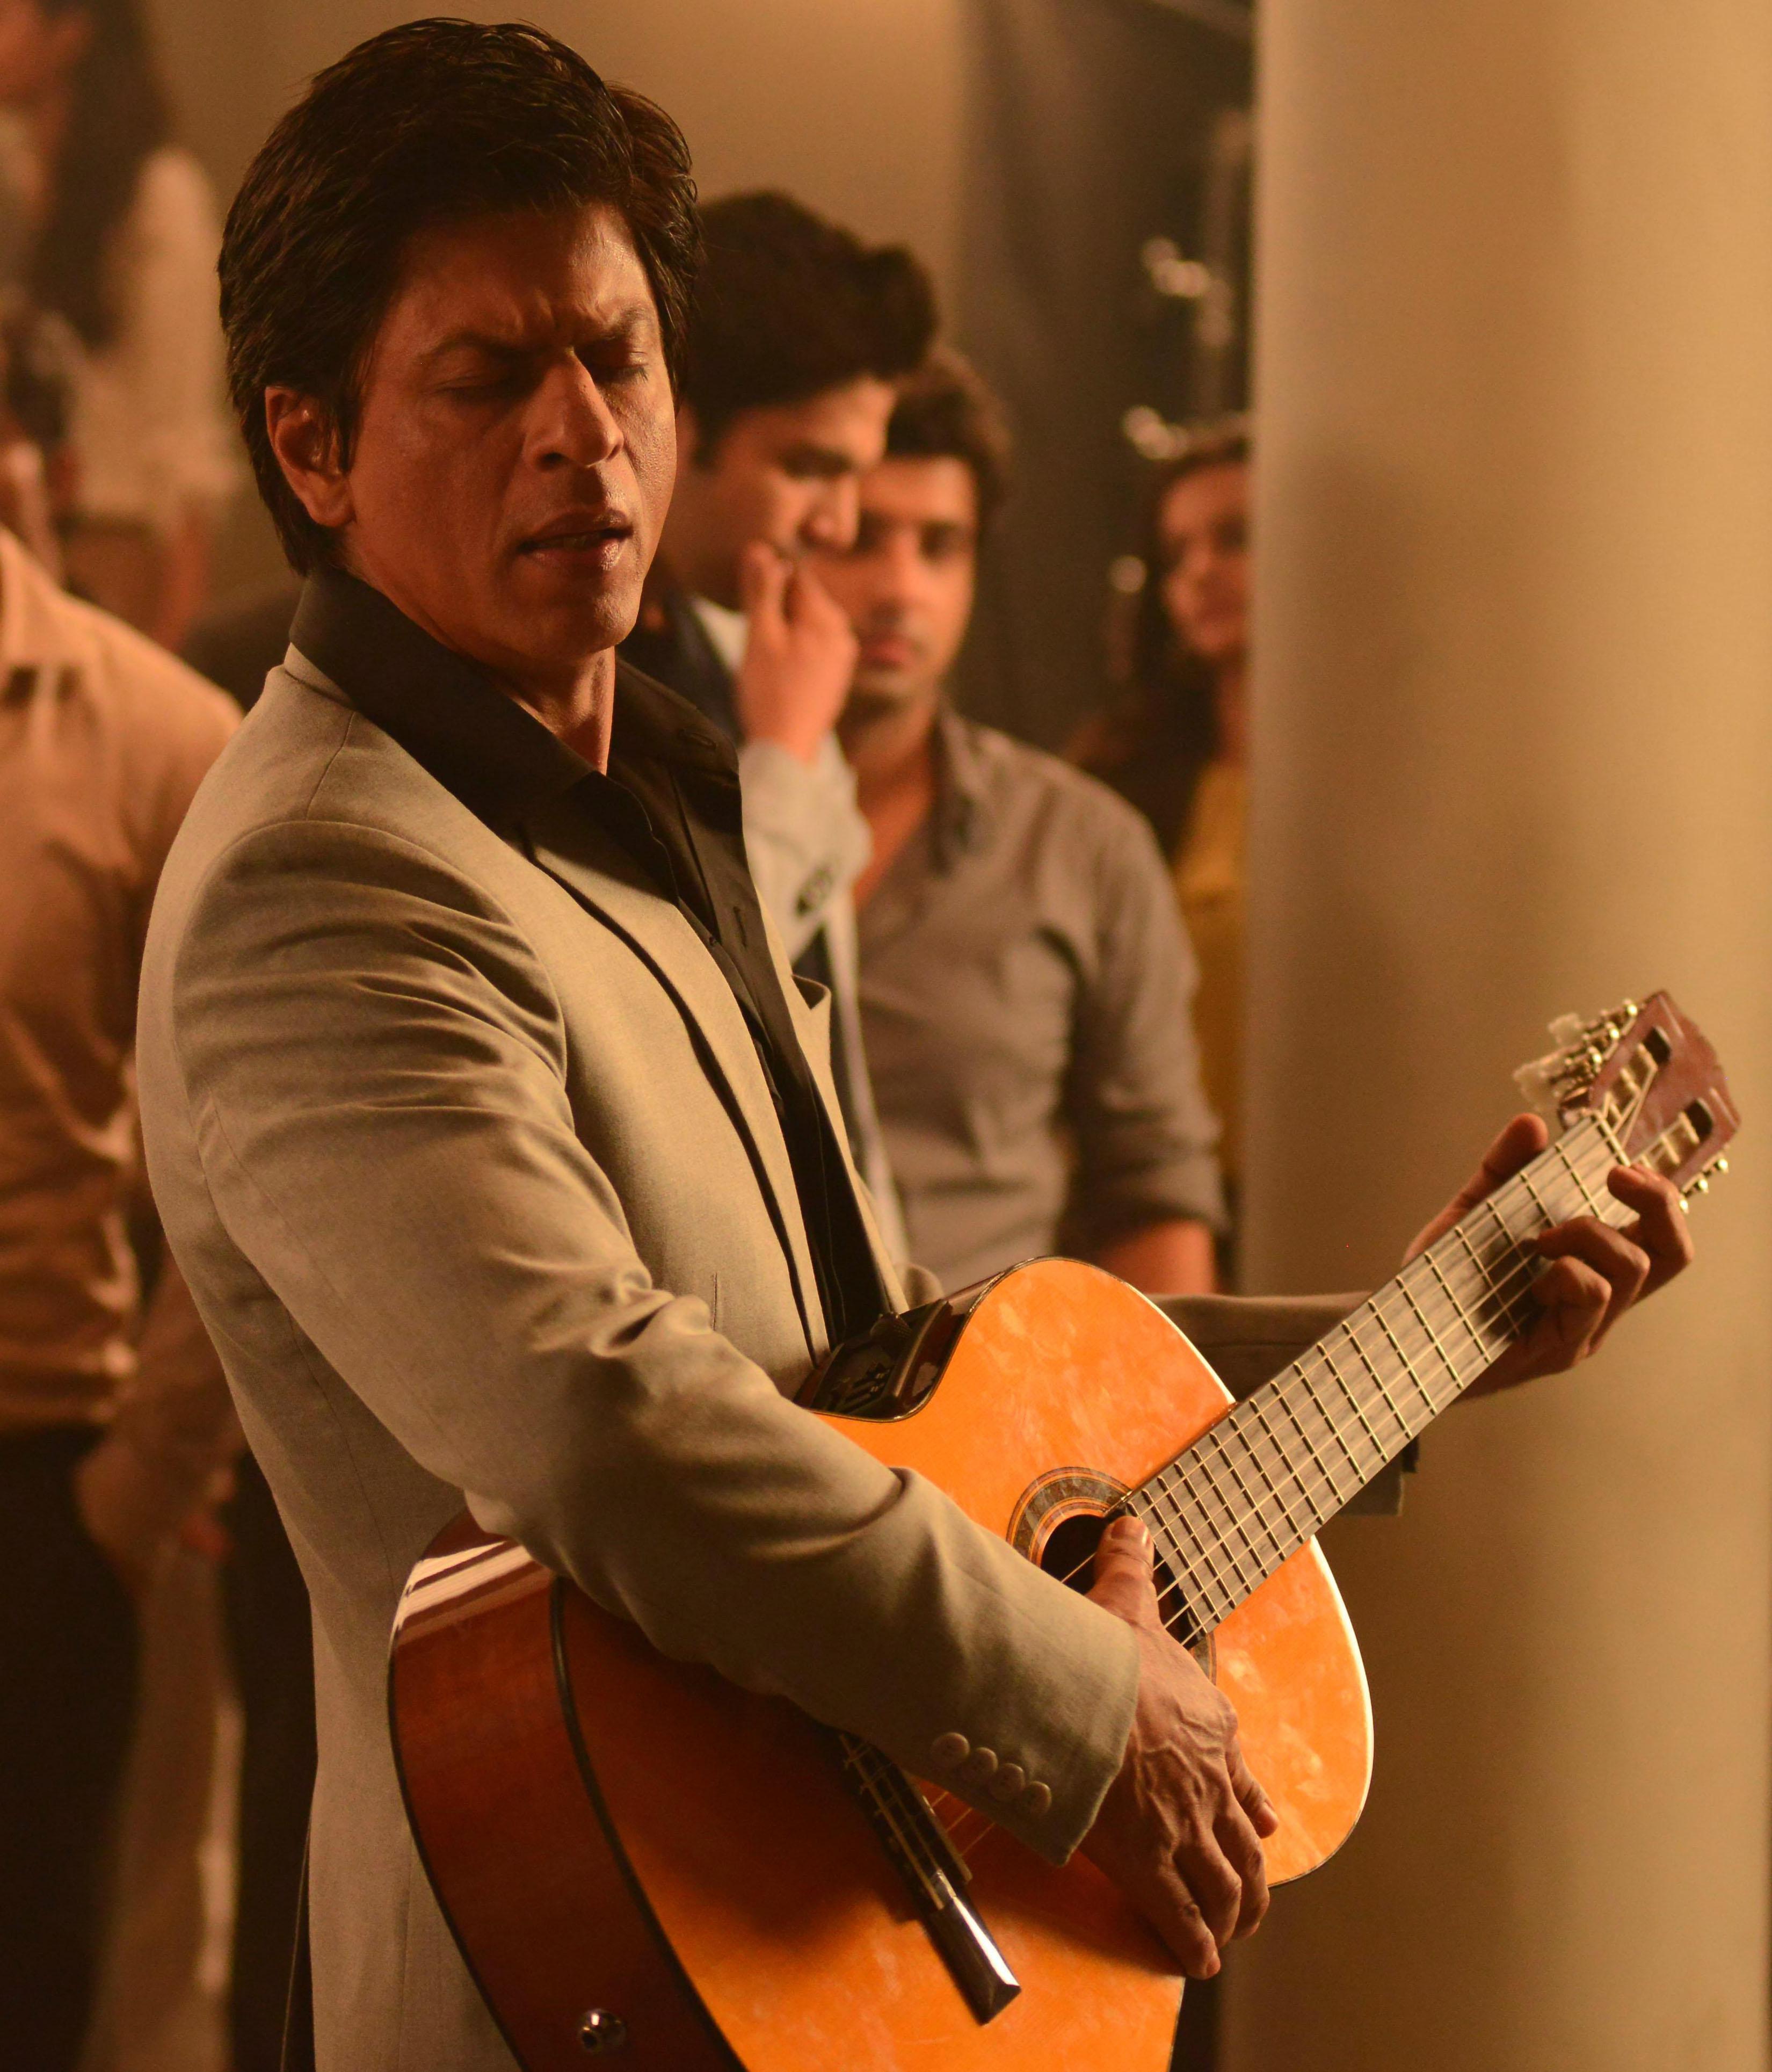 SRK, Katrina's Lux moment